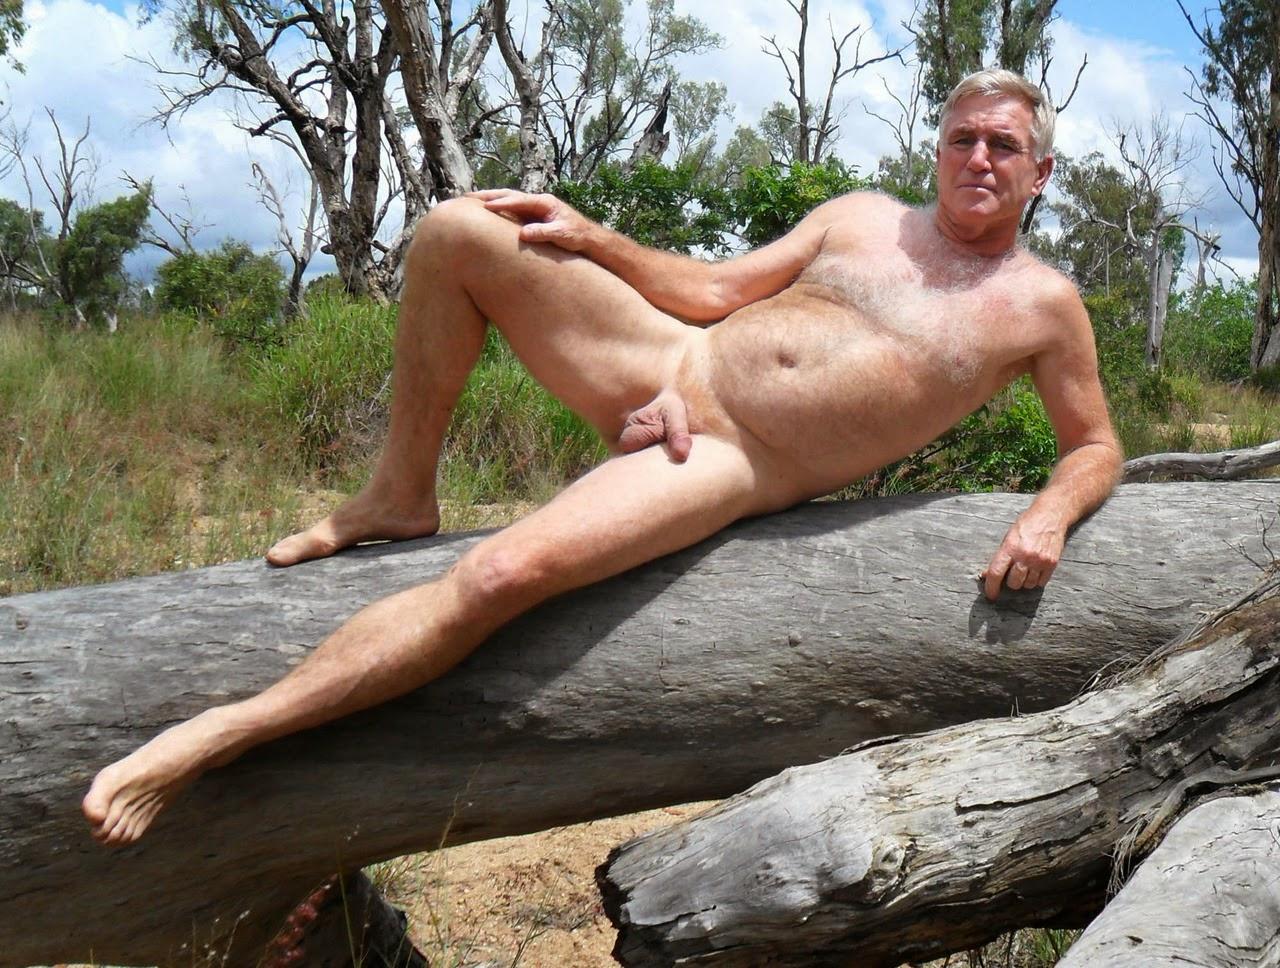 just regular naked people